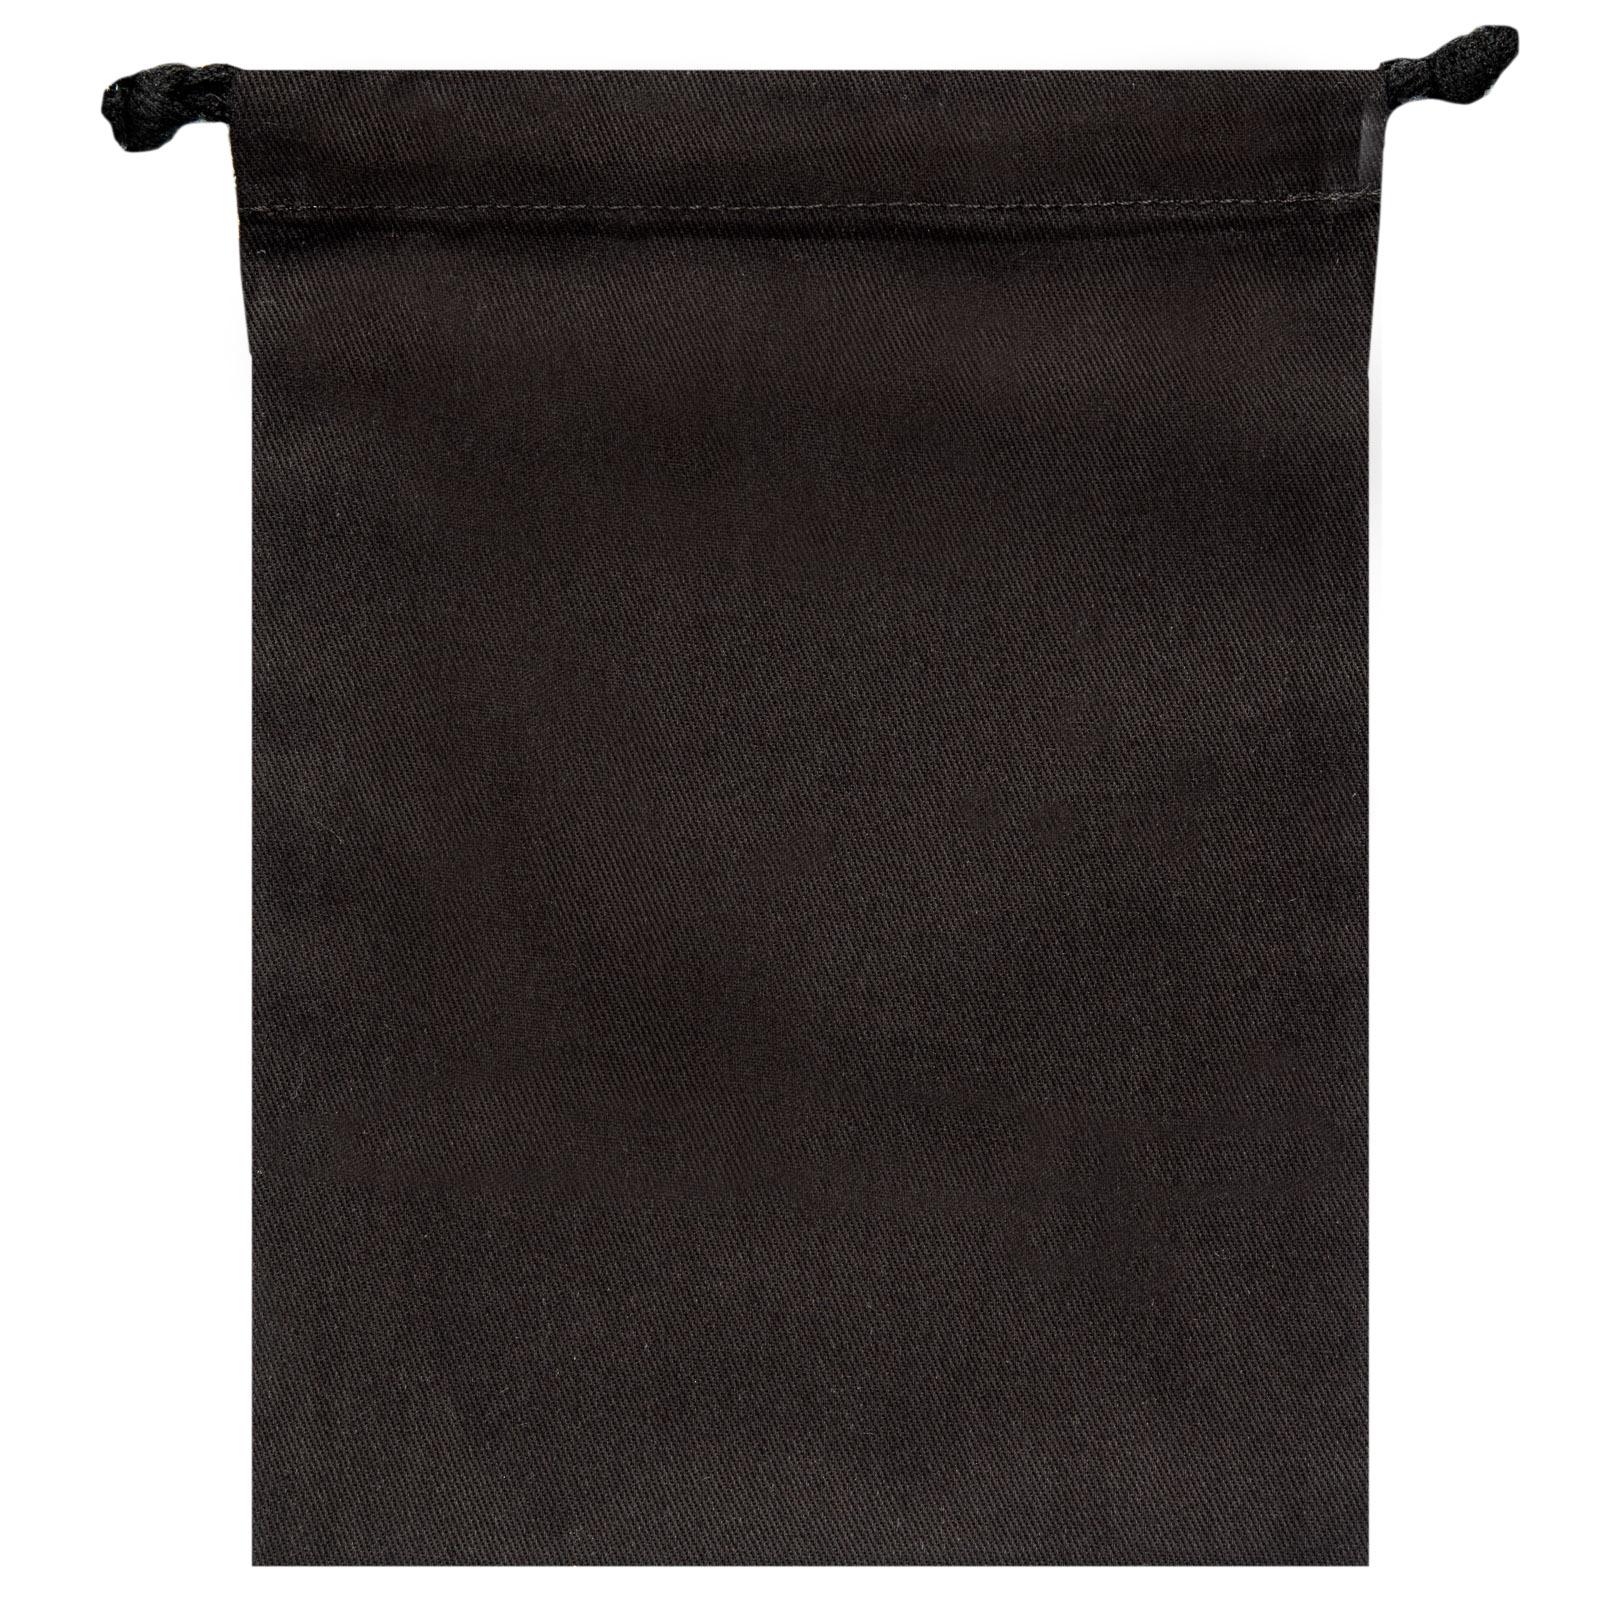 "Signature Napkins Face Covering Storage Pouch – 8"" x 6"" Drawstring Bag - 100% Cotton – 10 x Pack - Black"